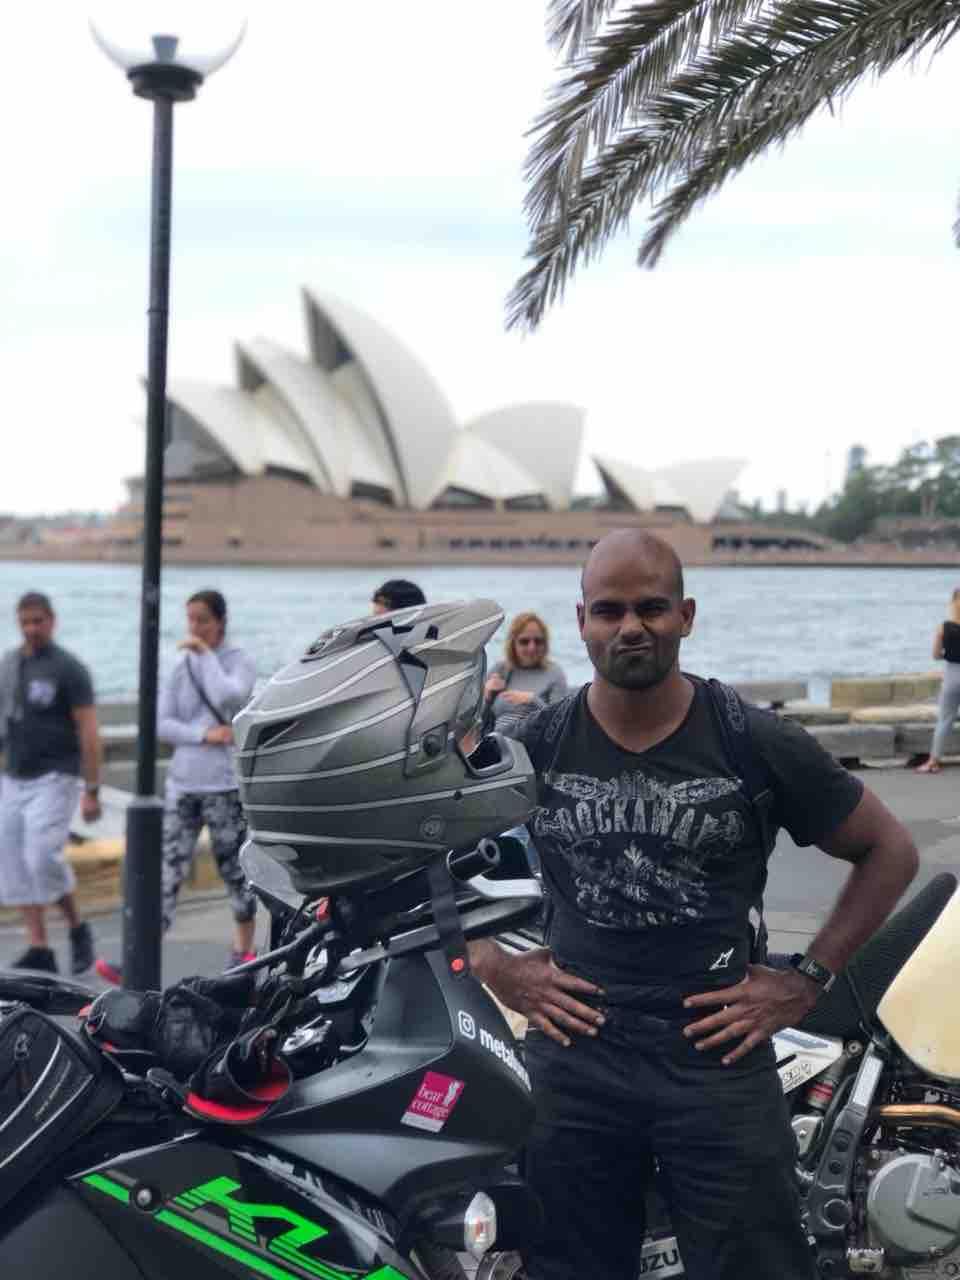 Lincoln with his Kawasaki KLR 650 in Sydney, Australia